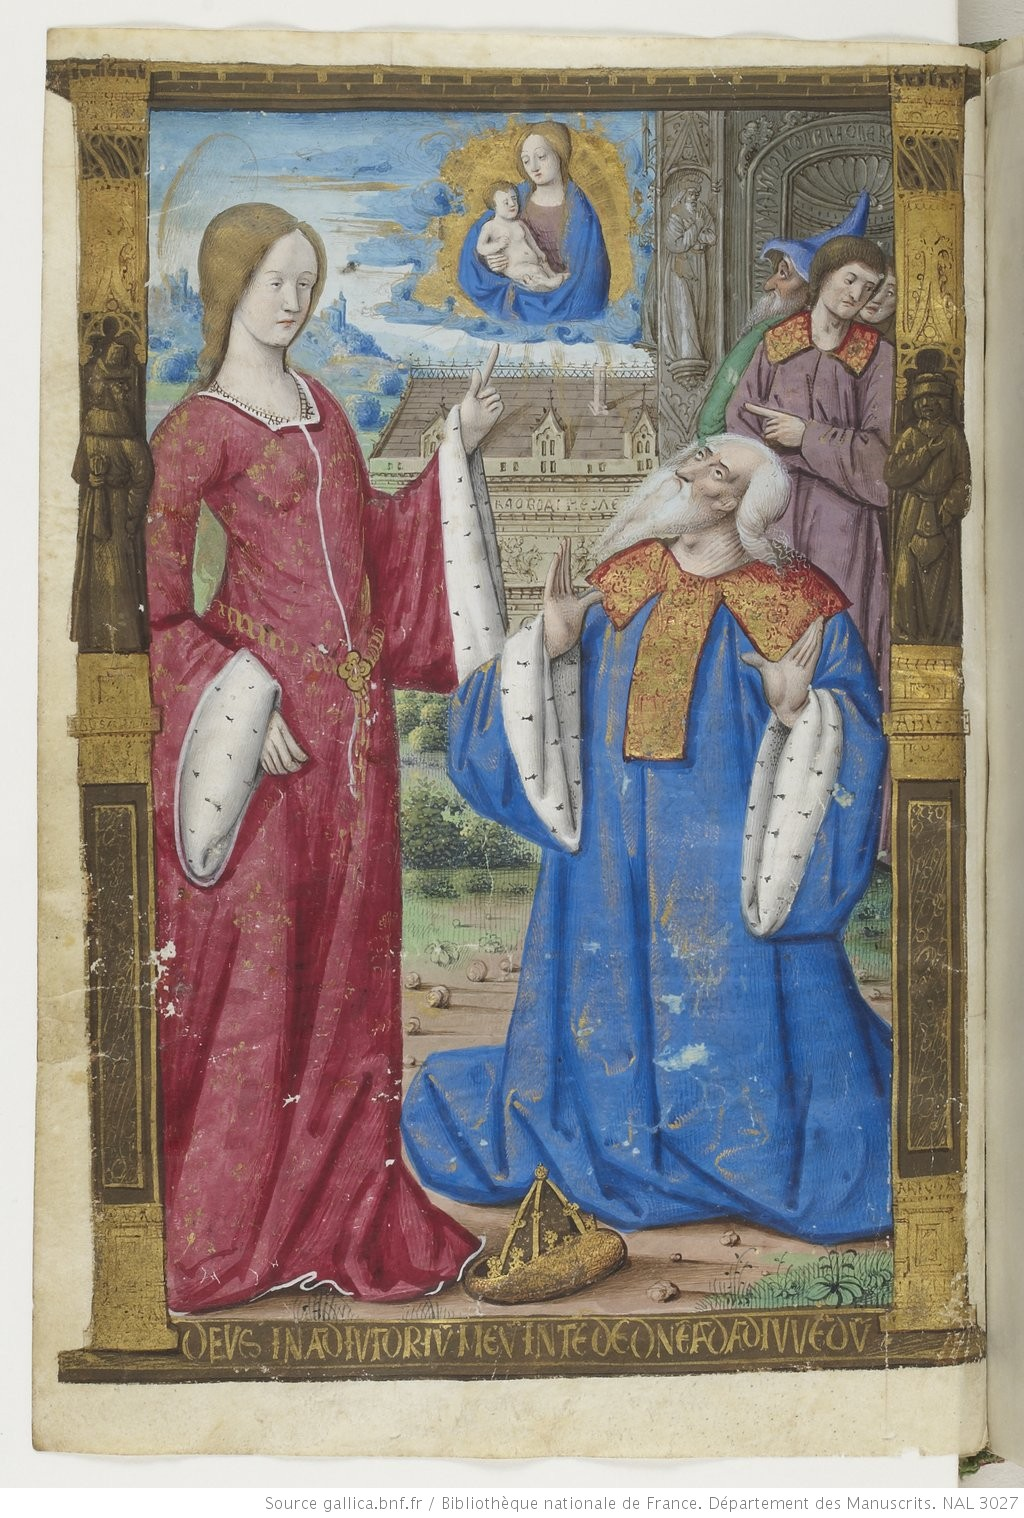 1500-05 Maitre des Triomphes de Petrarque Petites Heures d'Anne de Bretagne Gallica BNF NAL 3027 fol 19v